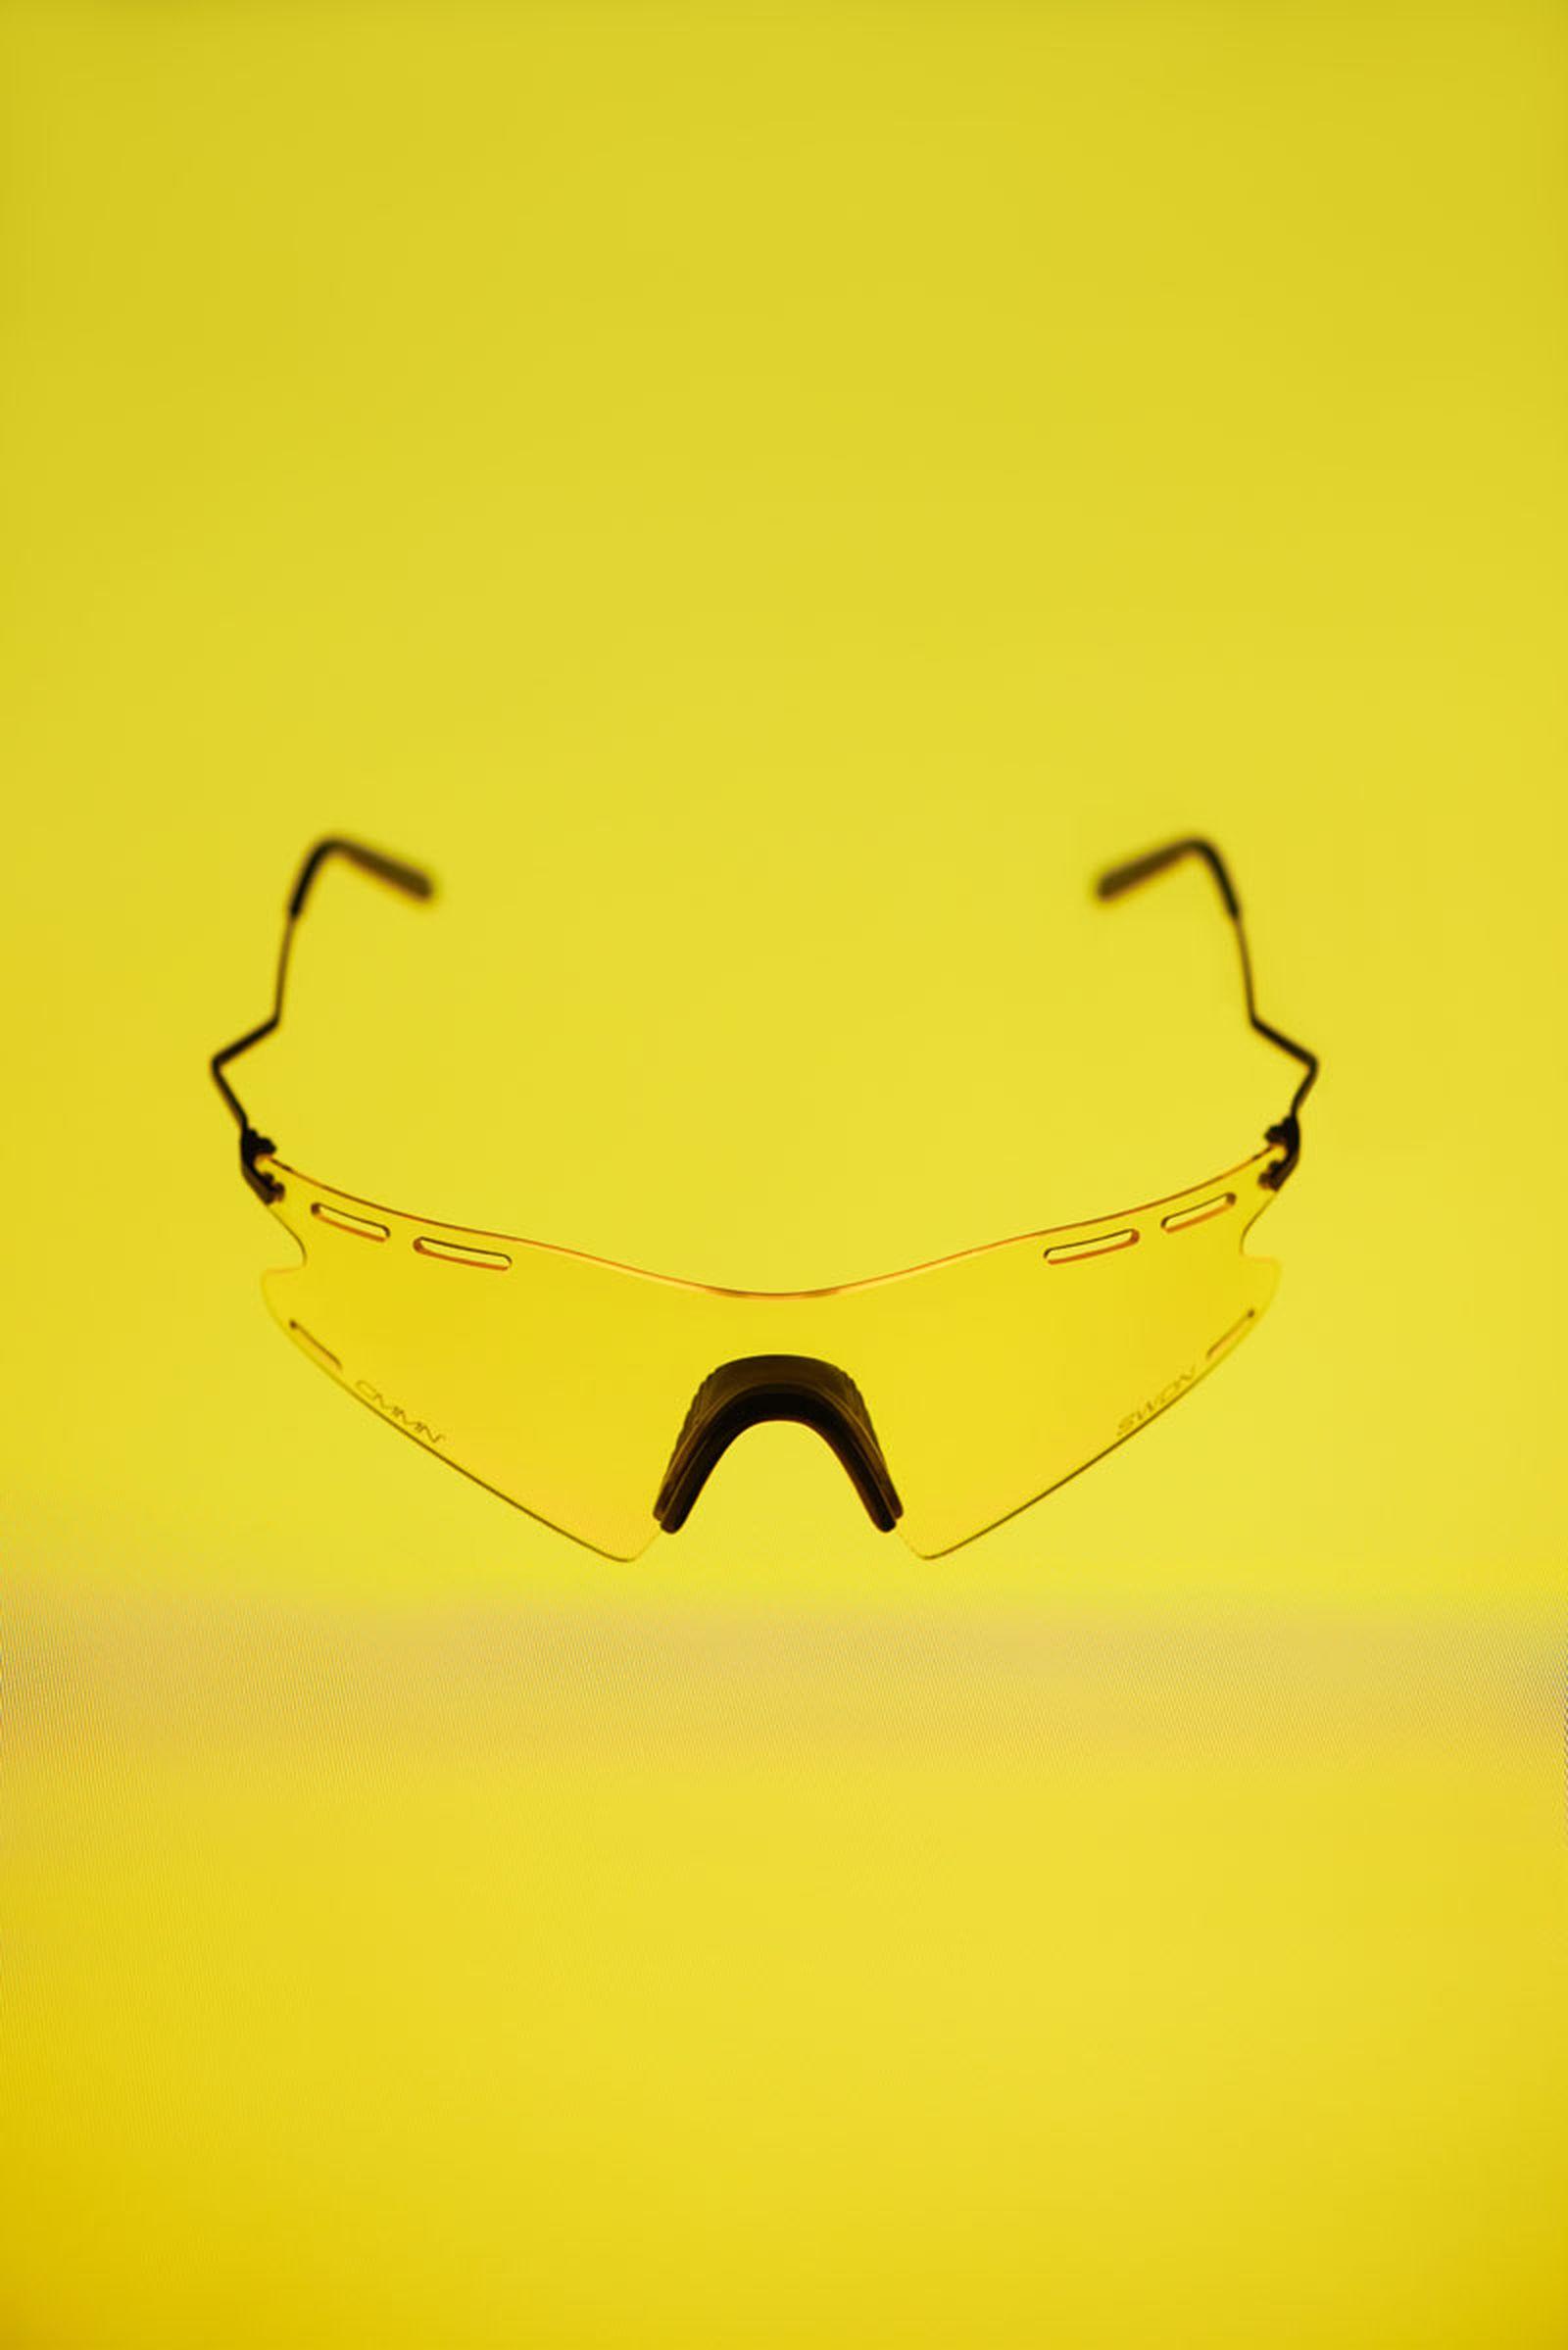 5cmmn swdn sunglasses ss19 Ace & Tate